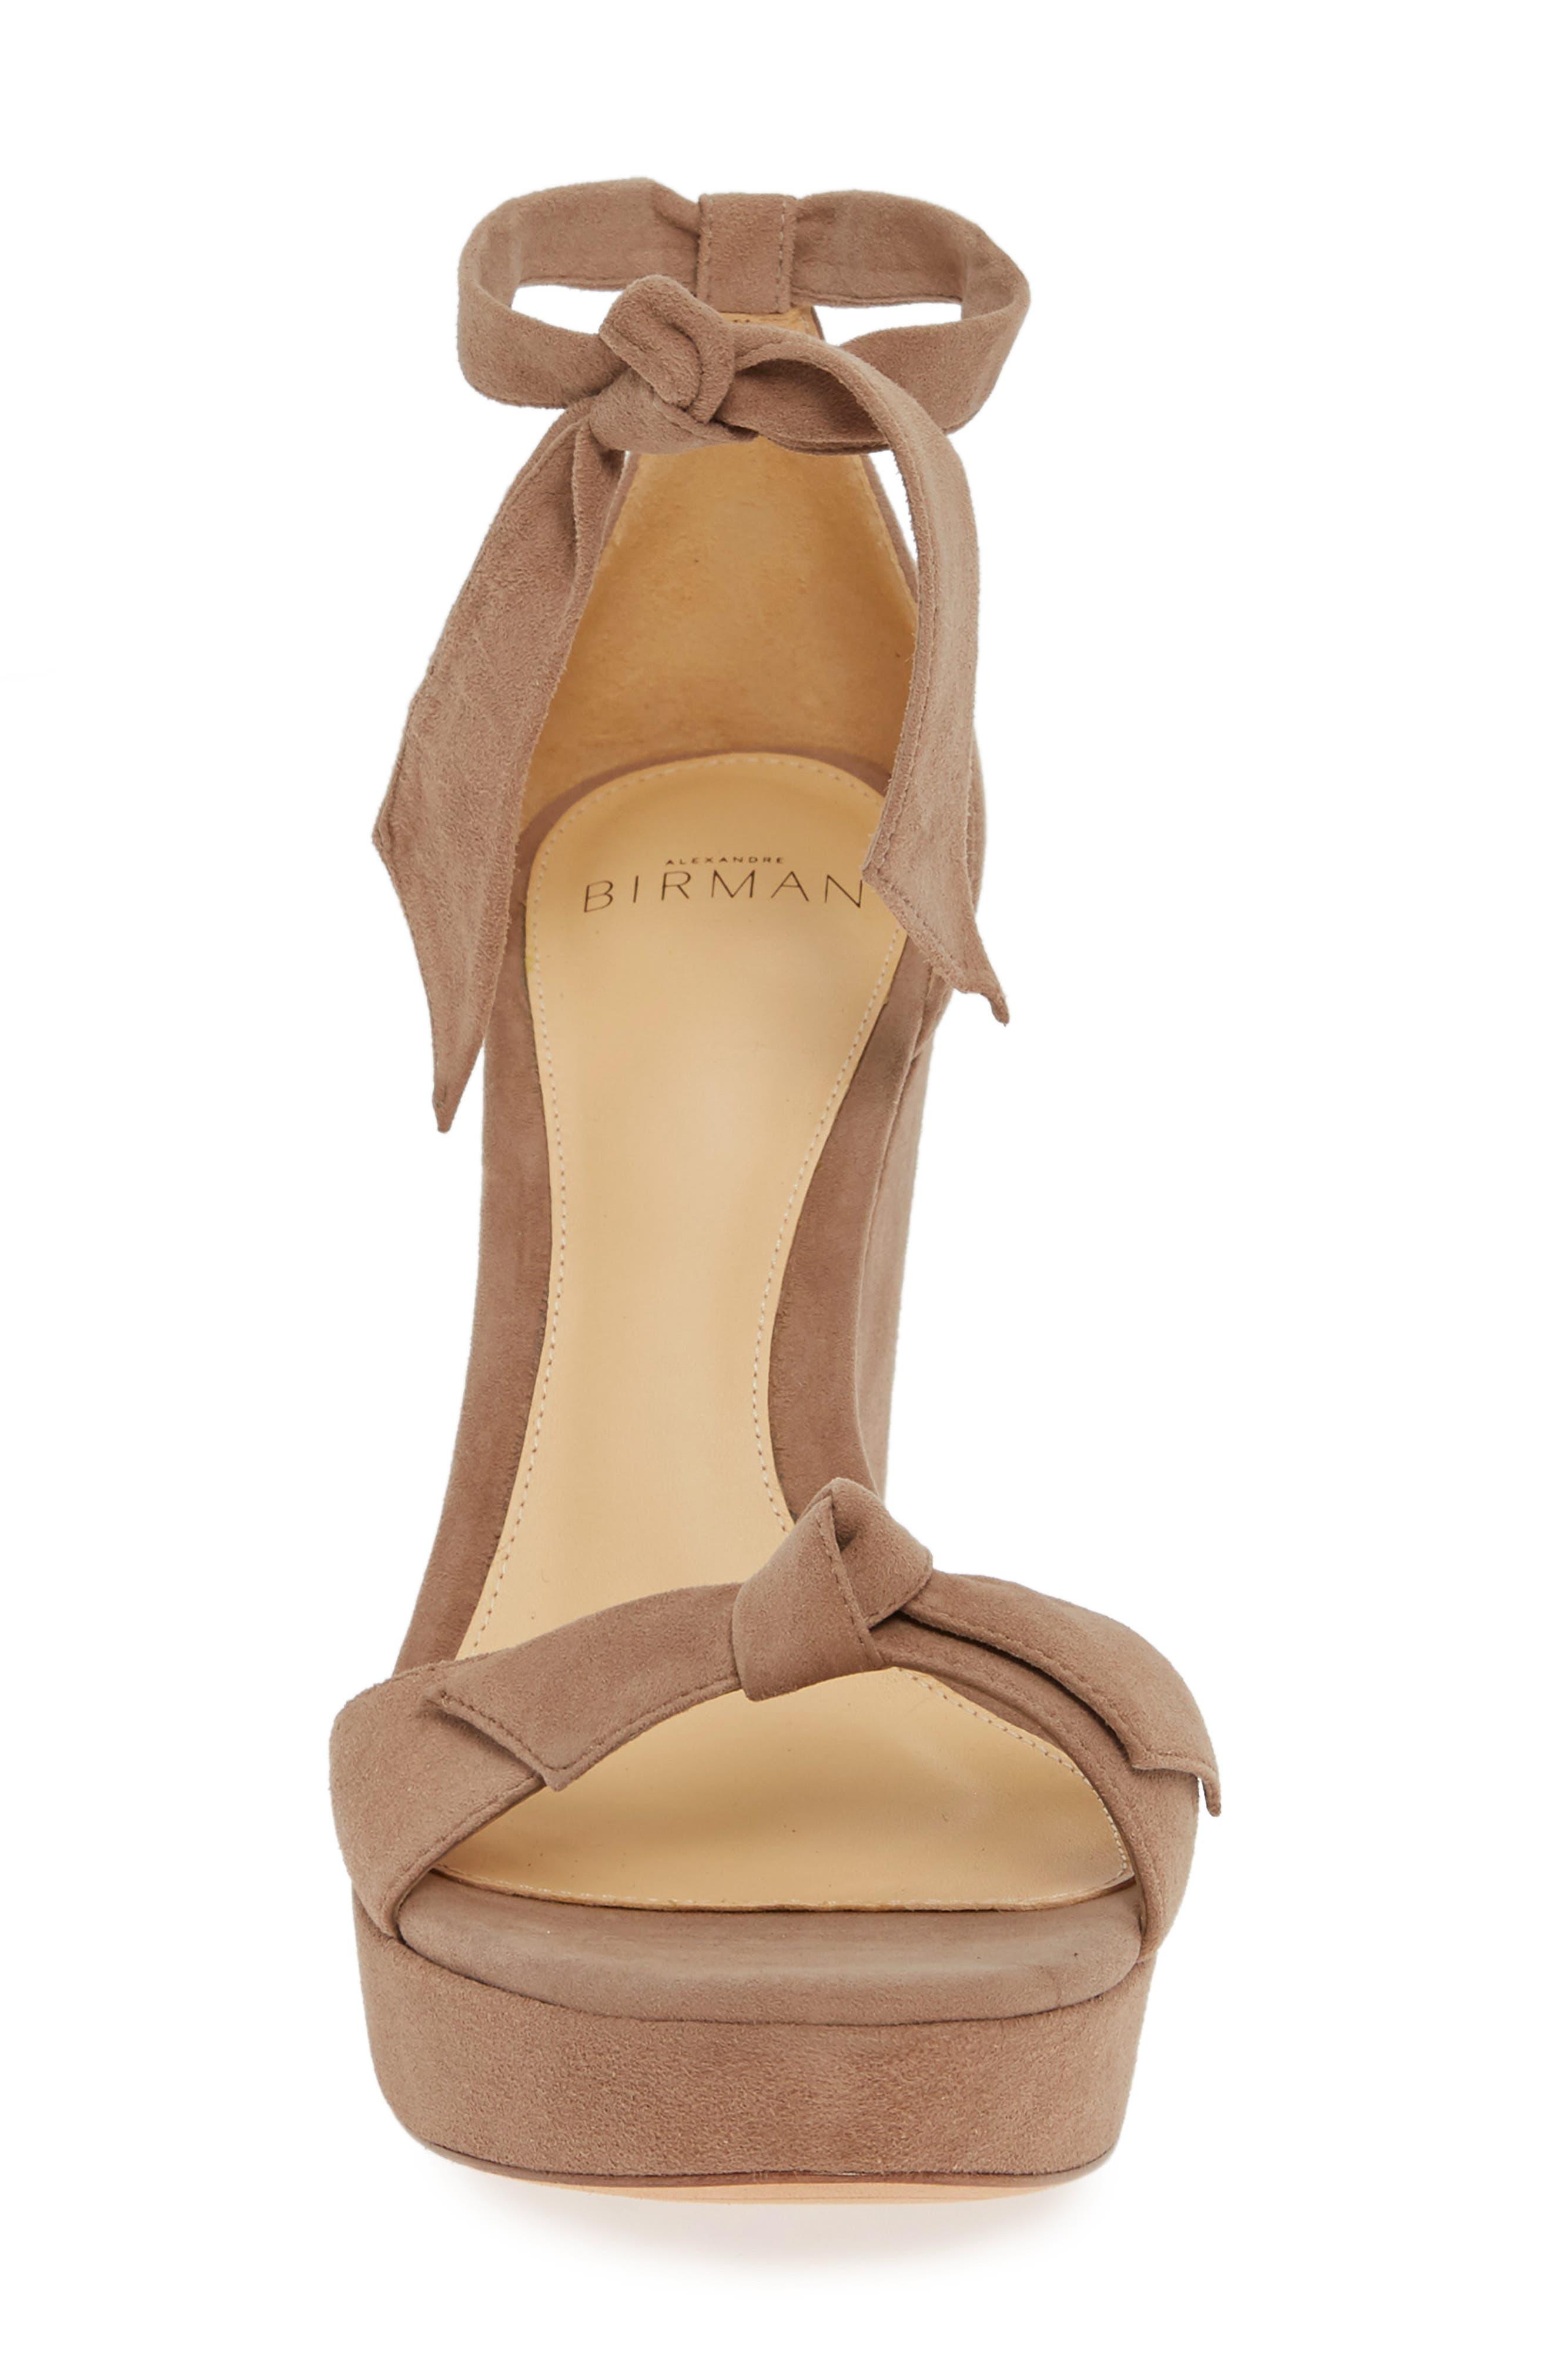 Clarita Platform Wedge Sandal,                             Alternate thumbnail 4, color,                             CAMEO SUEDE